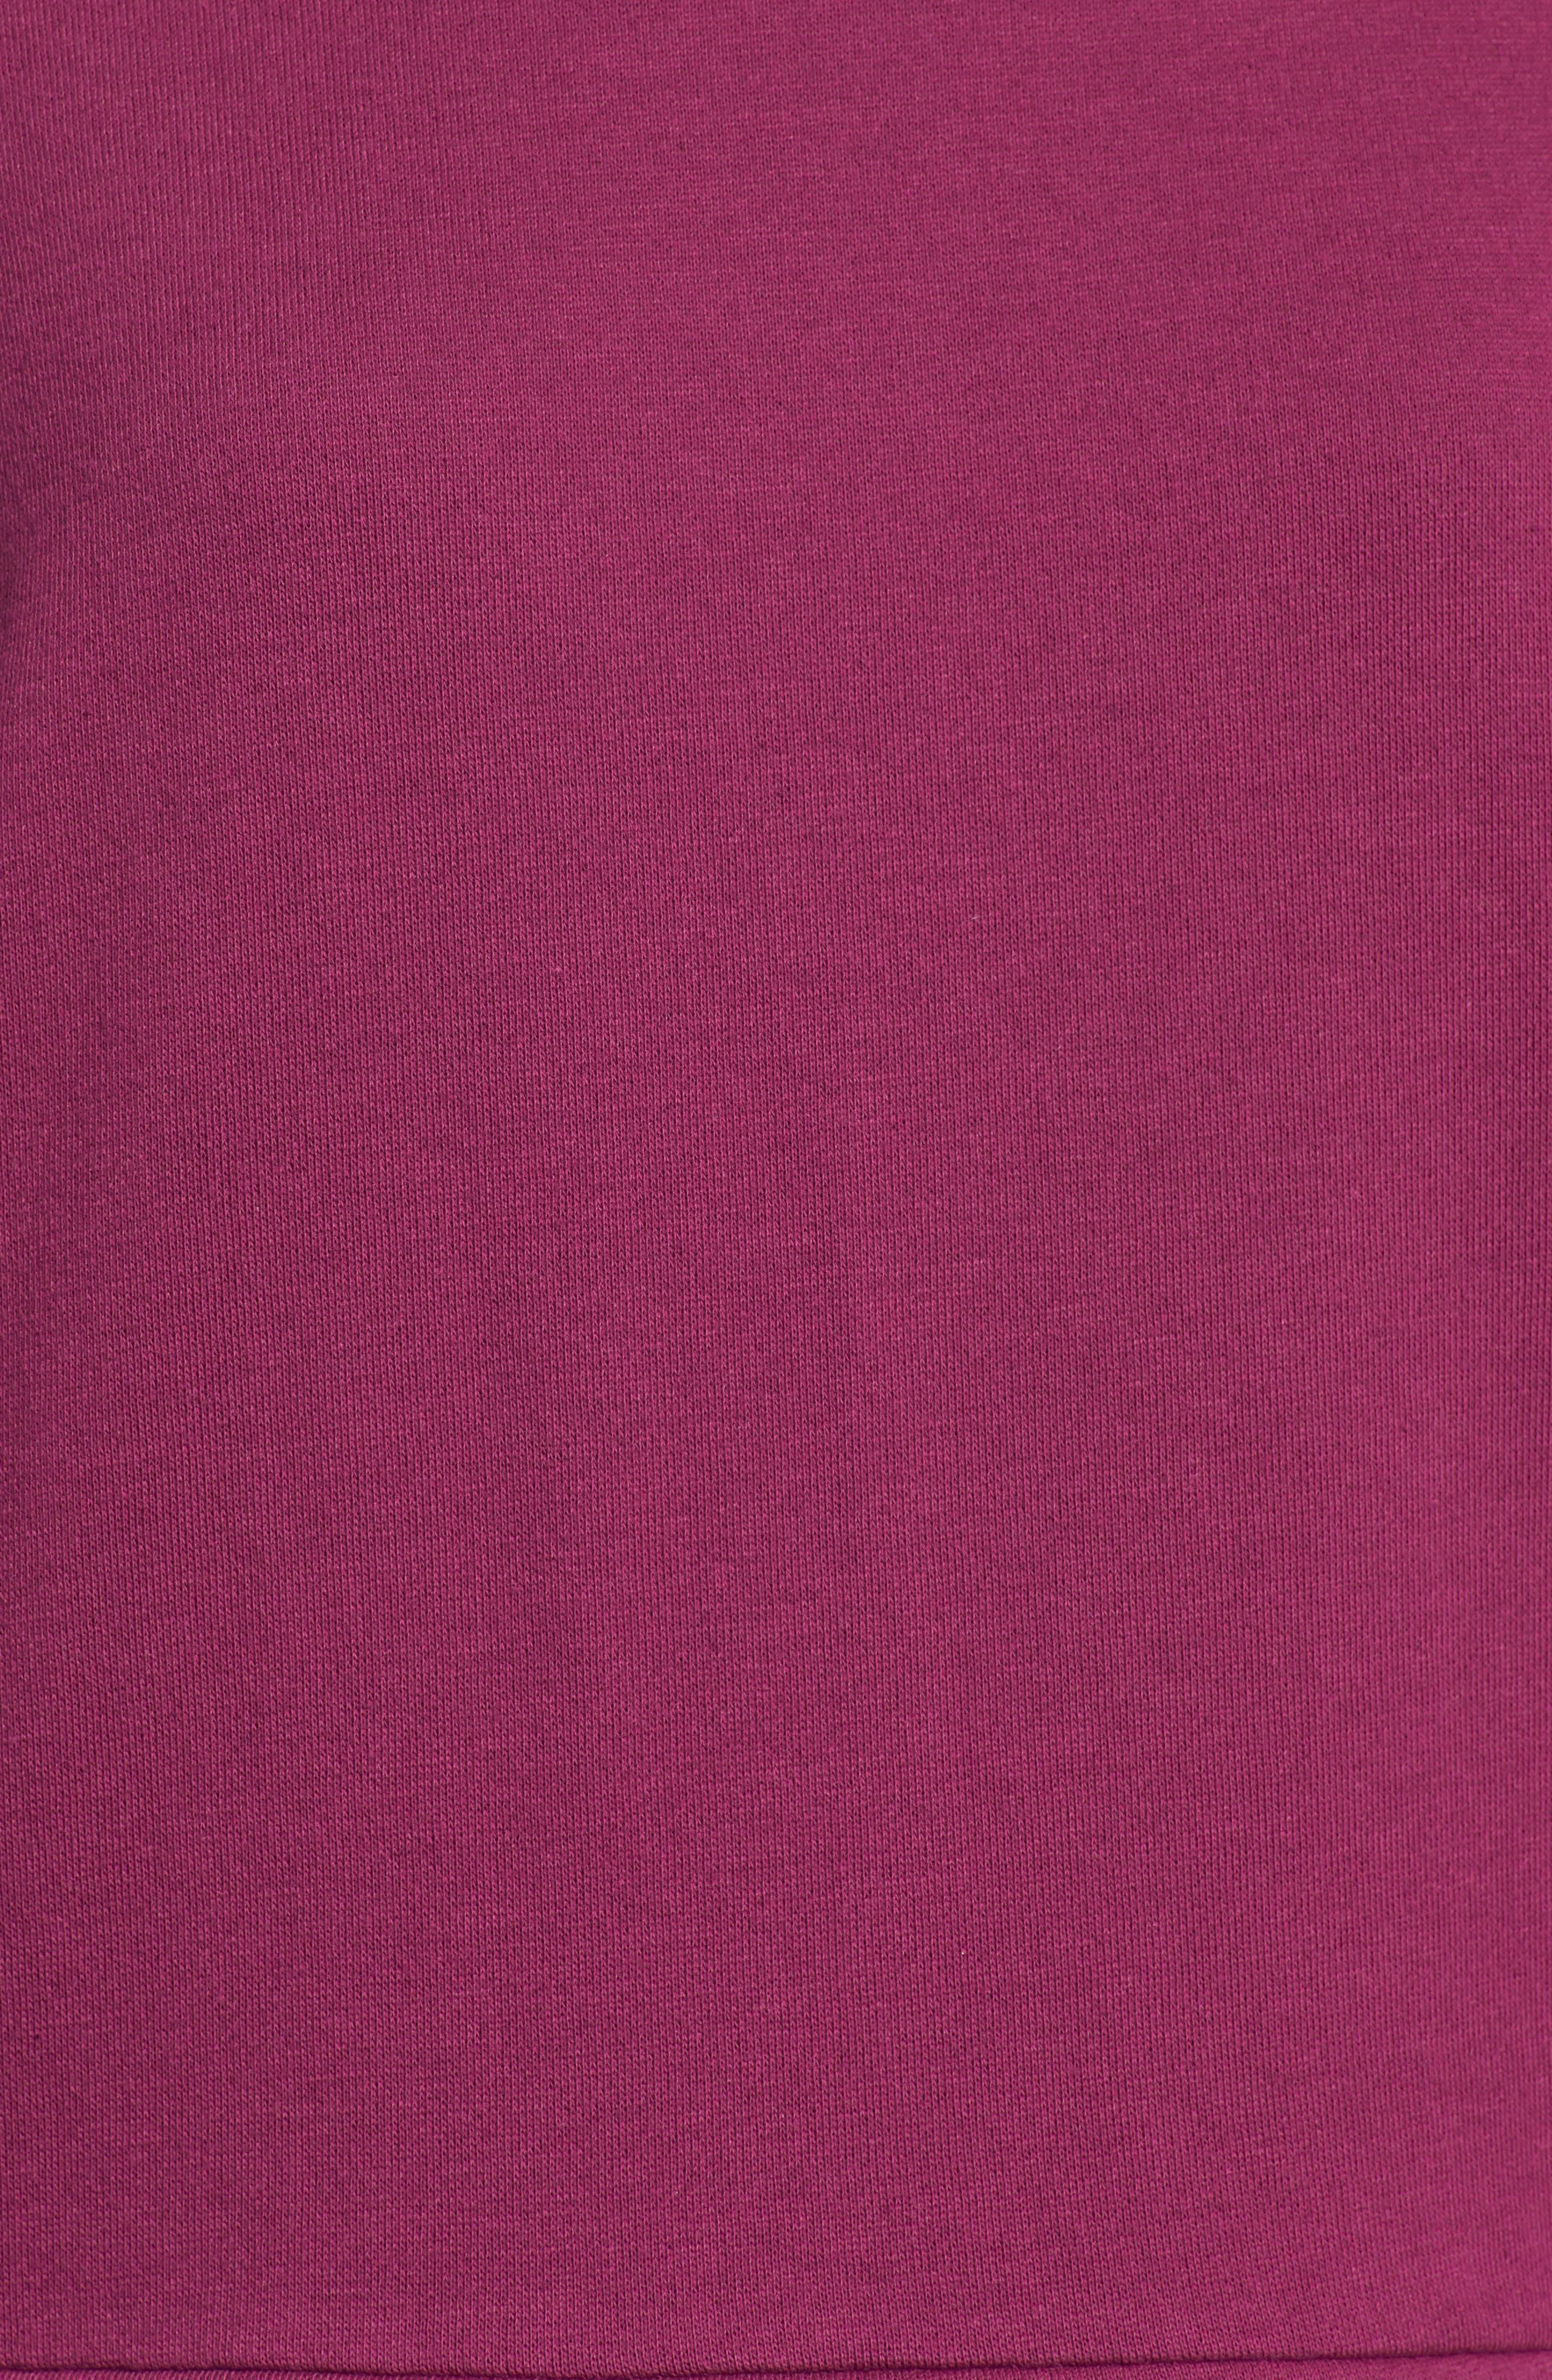 Eyelet Trim Sweatshirt,                             Alternate thumbnail 5, color,                             PURPLE FUCHSIA